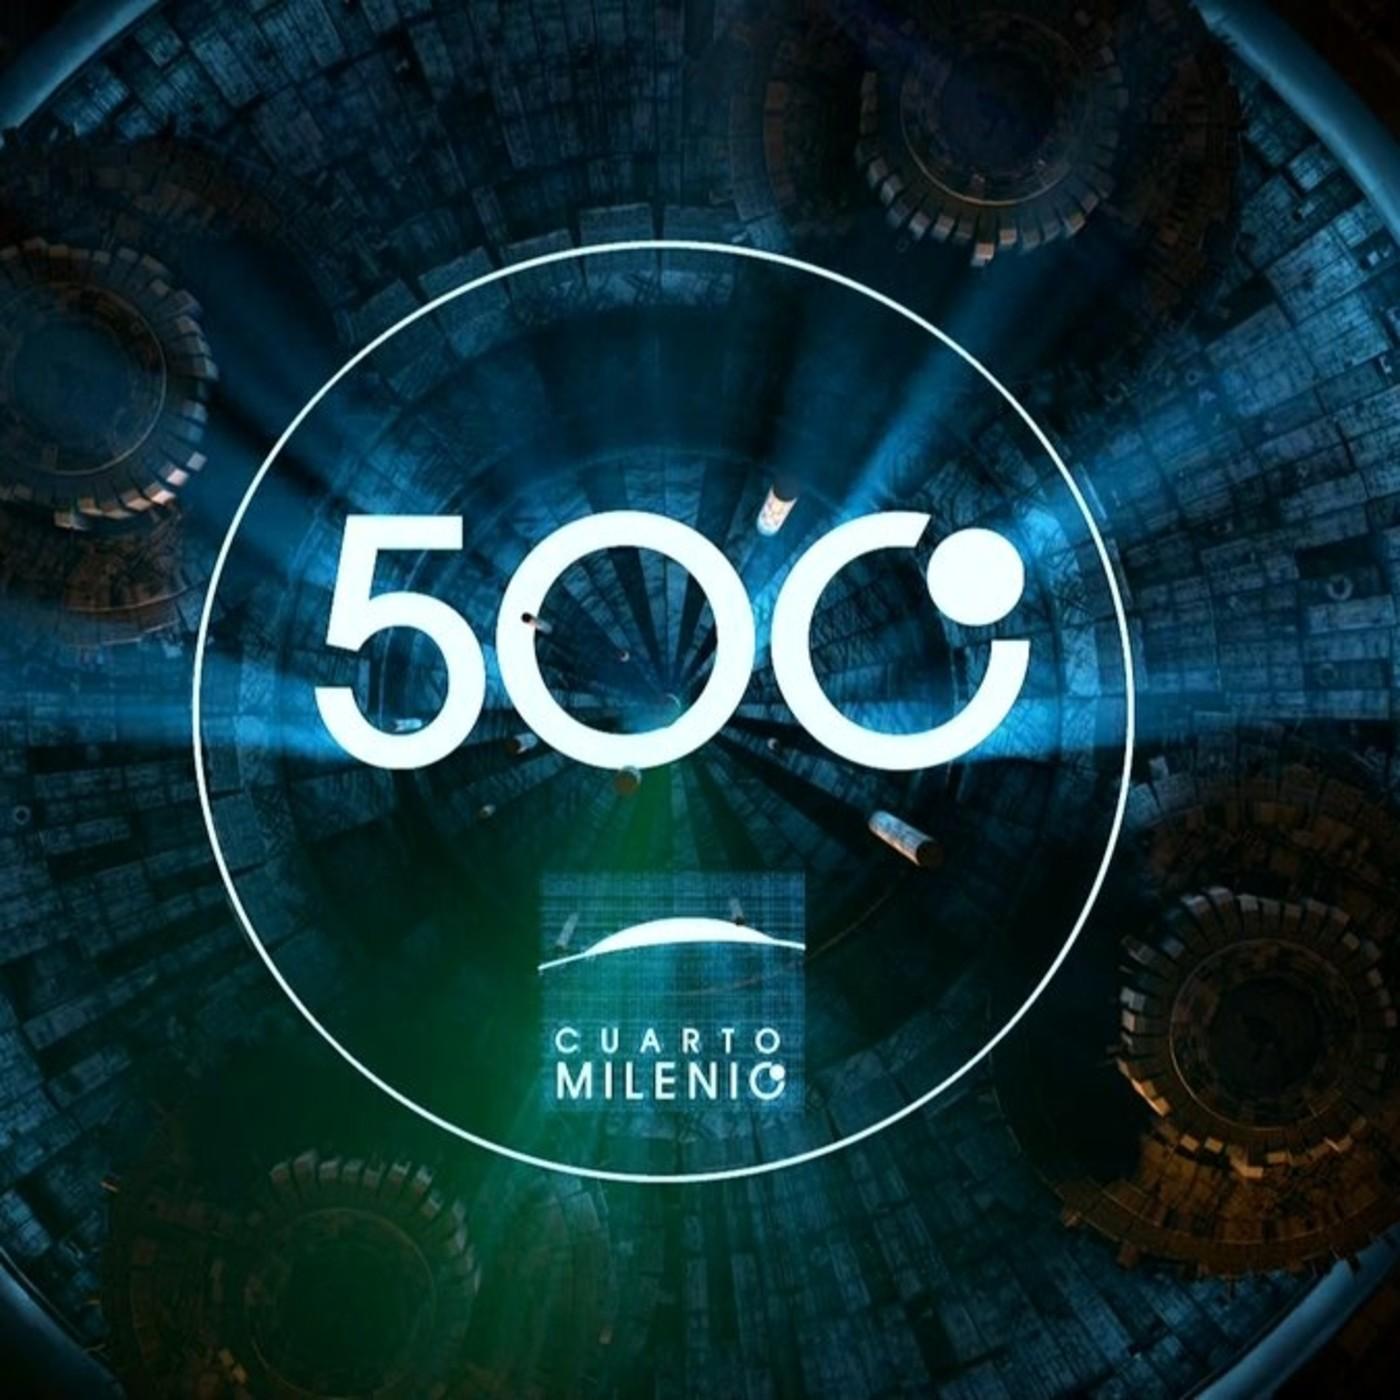 Cuarto Milenio 500